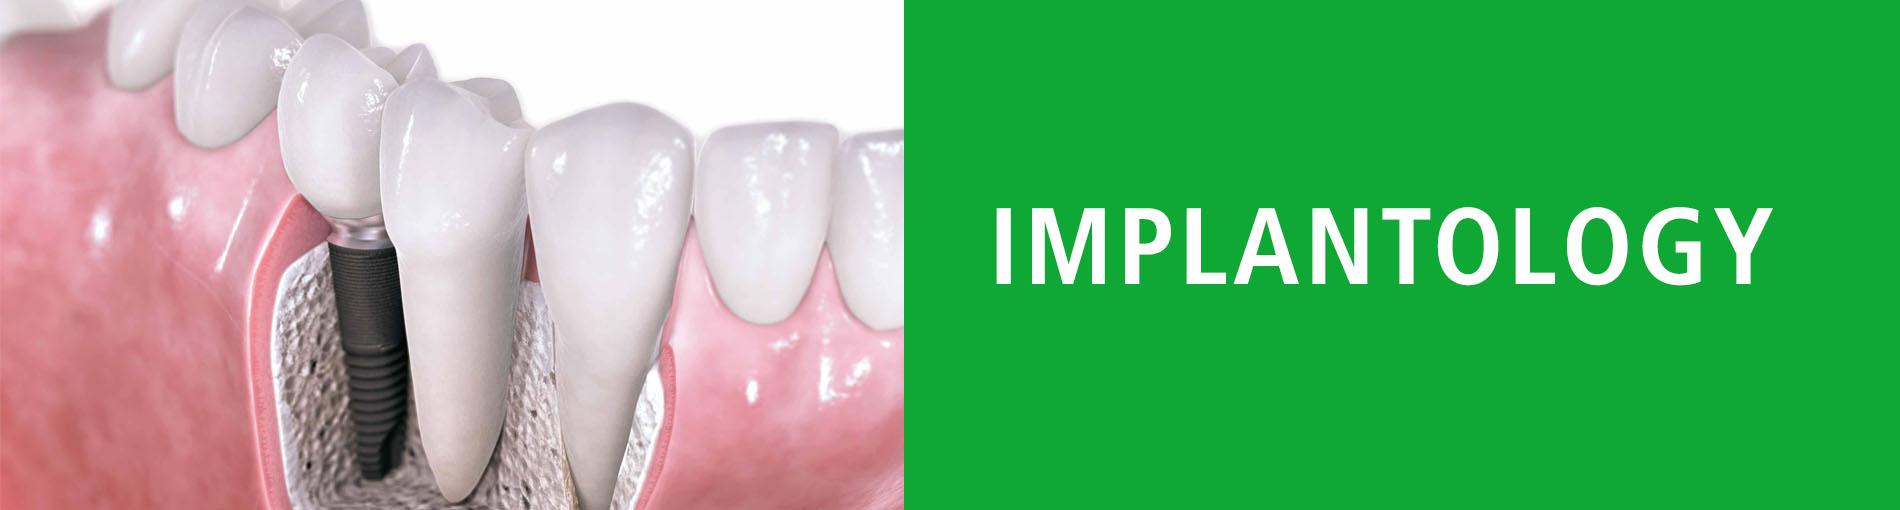 Implantology-Specialist-Dentist-Smile-White-smile-Healthy-smile-Patient-Success-Clinic-Clinics